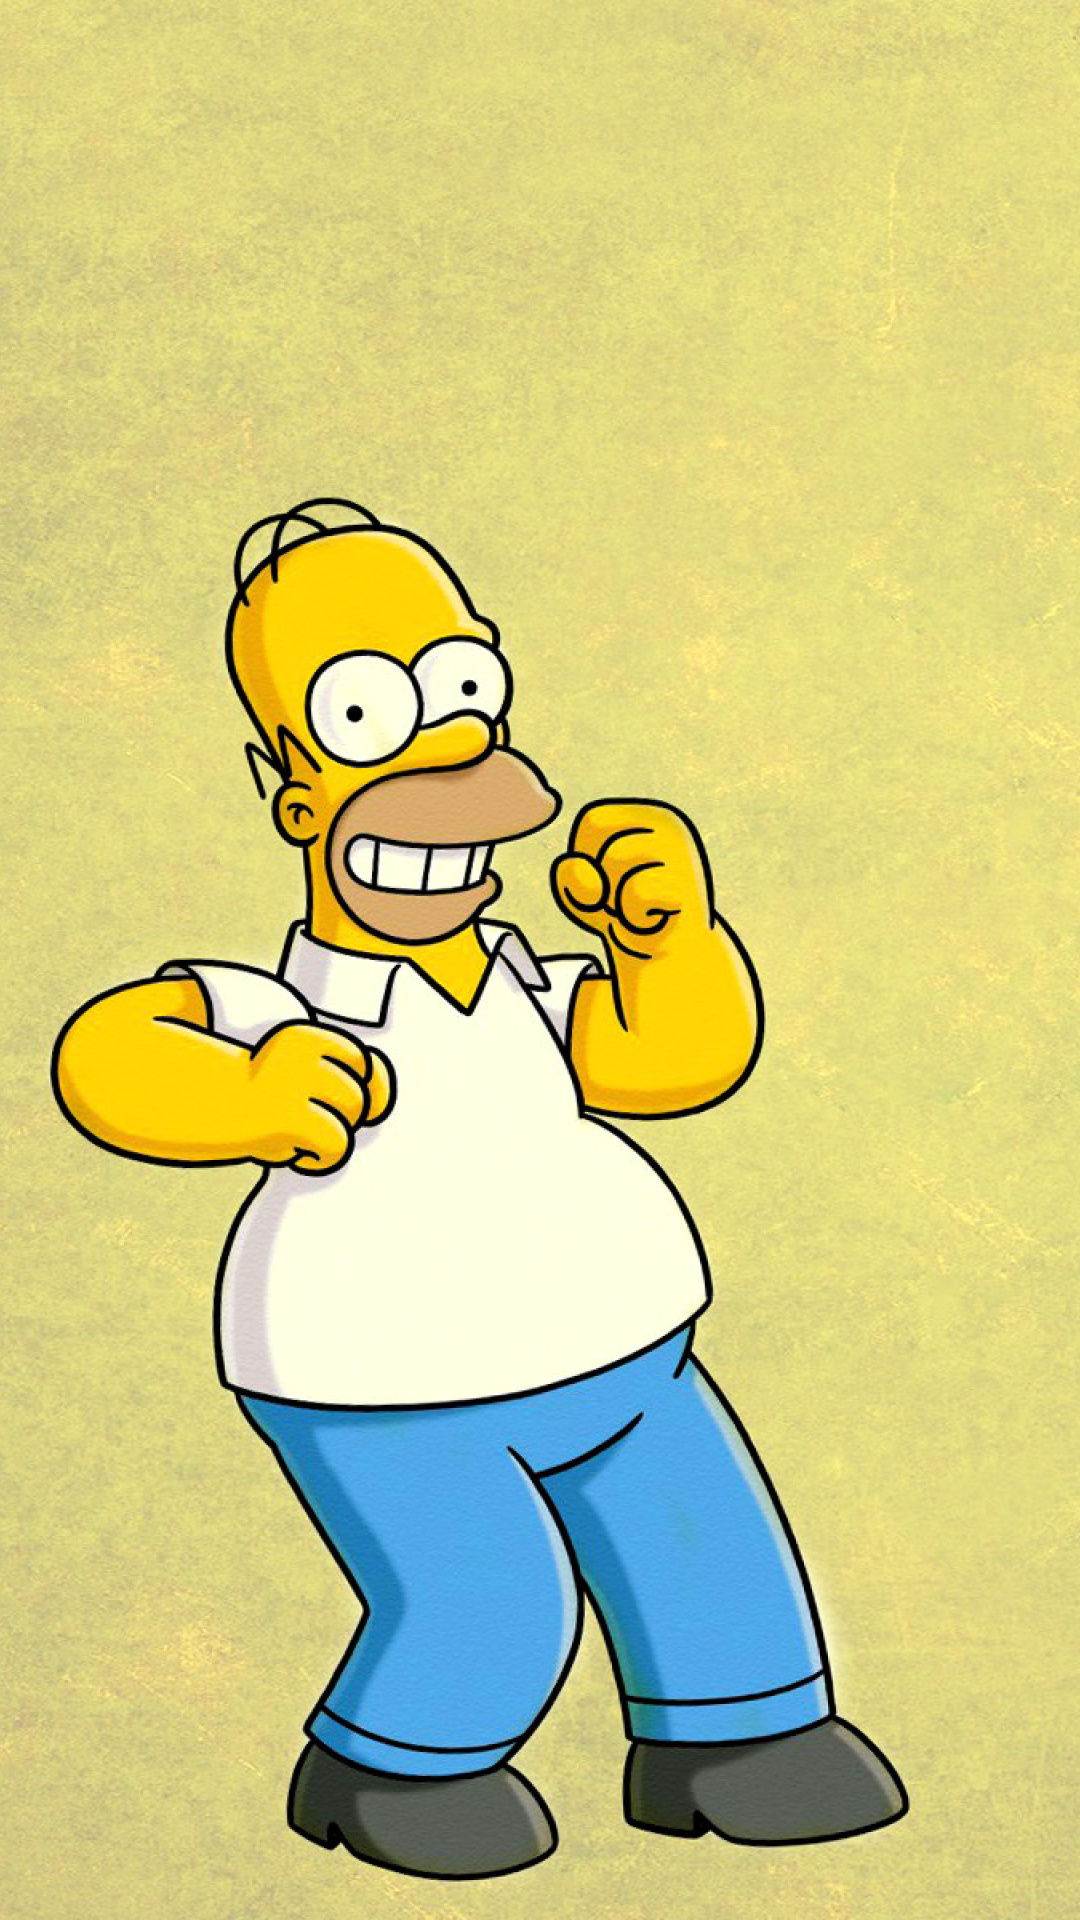 Смешные картинки, гомер симпсон картинки на телефон